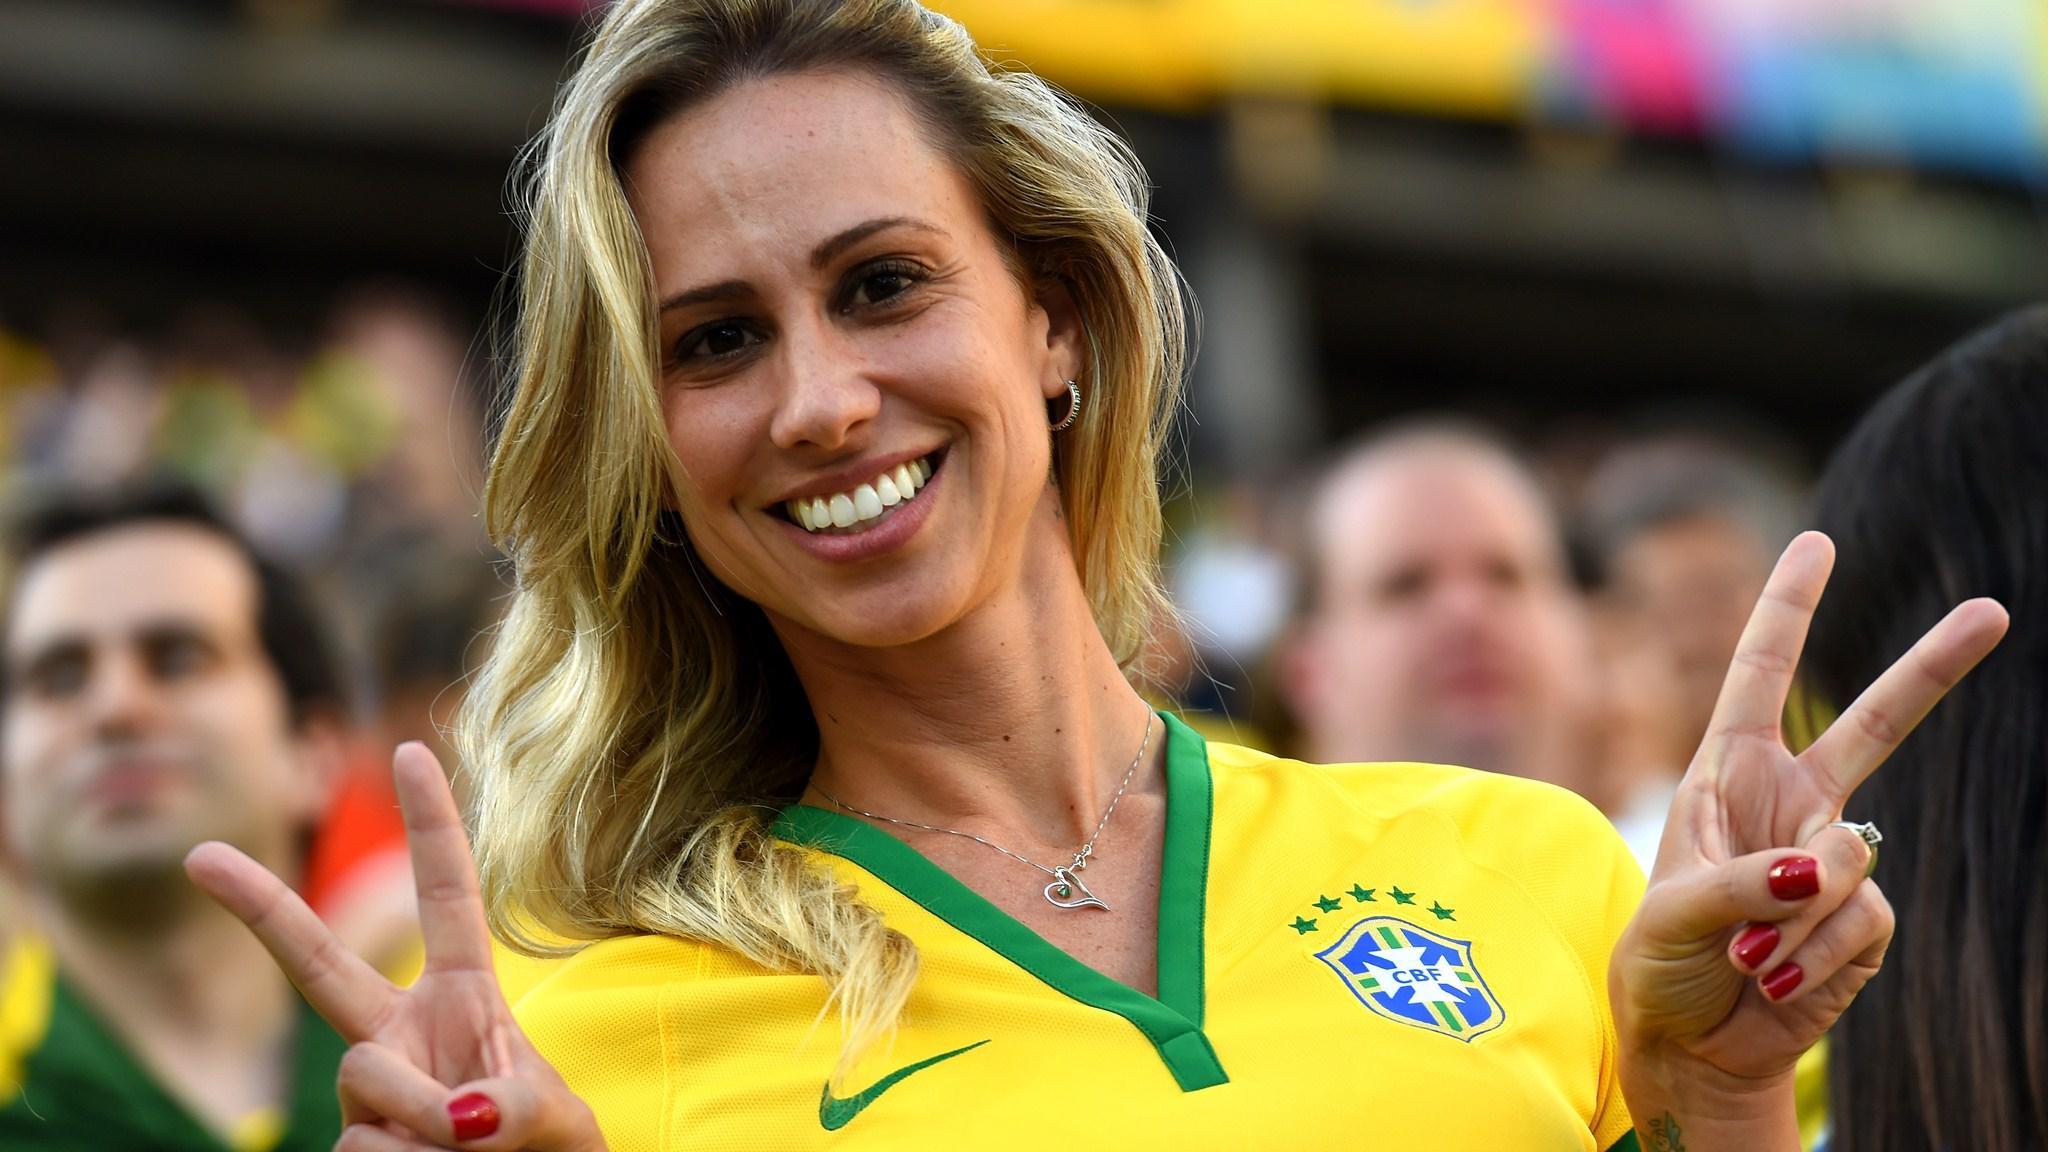 190 - Brazil-Croatia [3-1] -- 12 Jun 2014 - 17-00 -- Sao Paulo - Arena Corinthians - kuaza